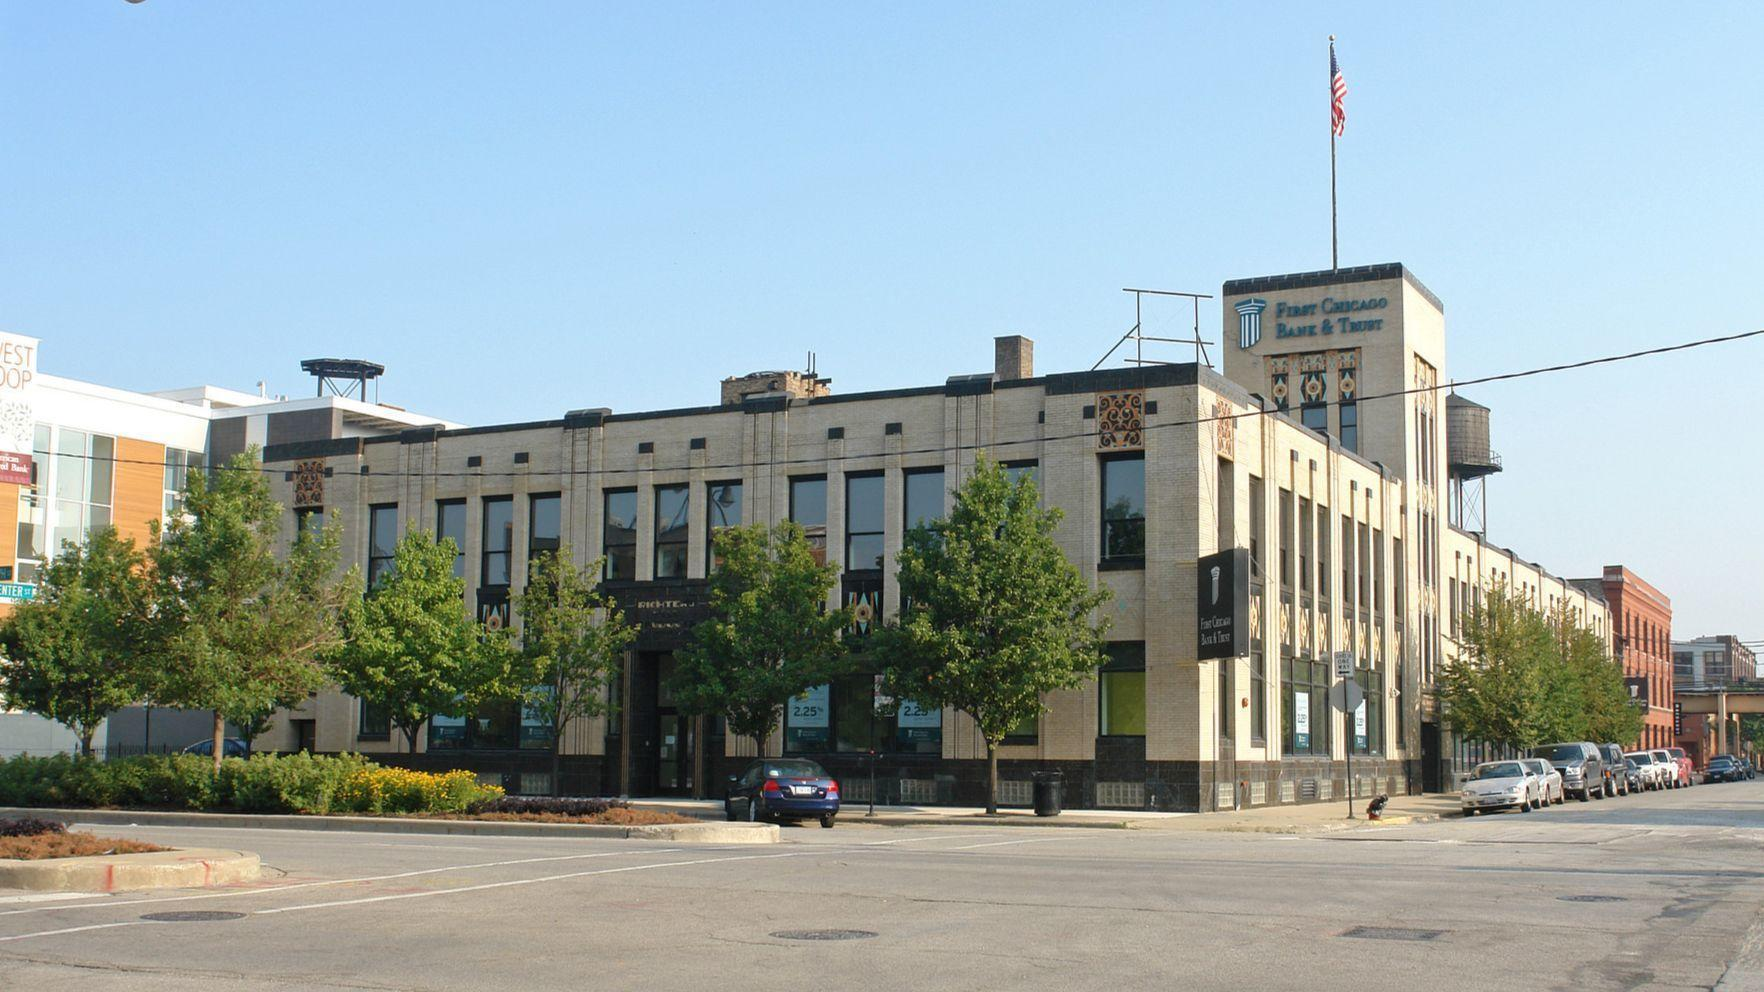 2 properties for sale near new McDonald's HQ - Chicago Tribune